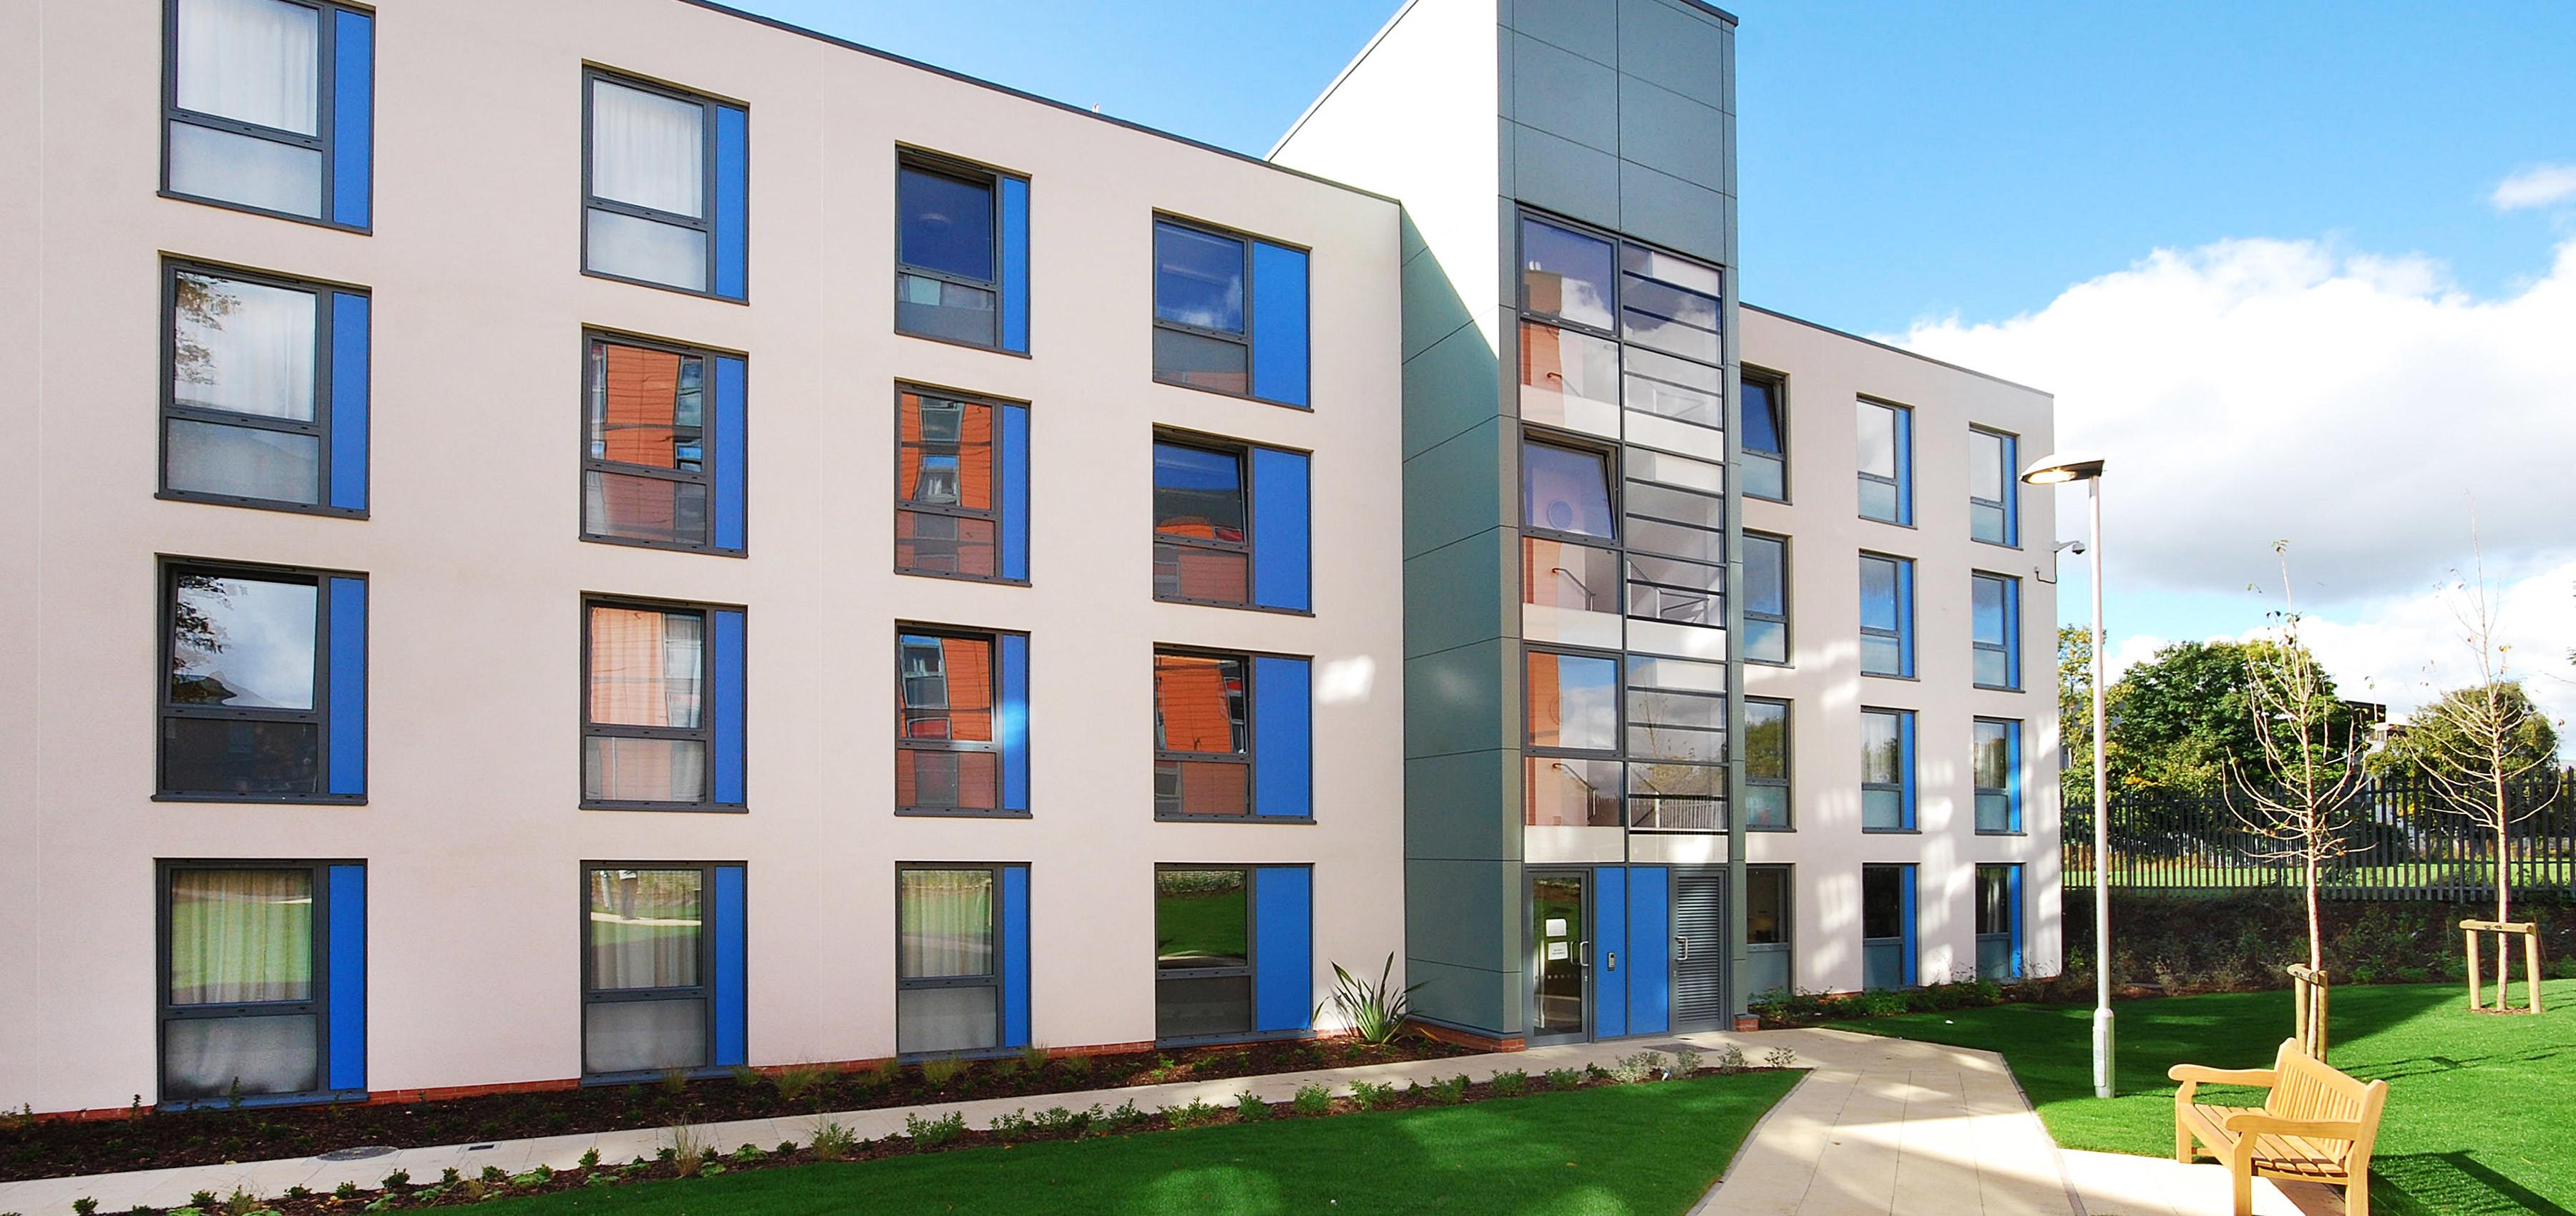 Horton Halls - Hunters - Architects, Building Consultants